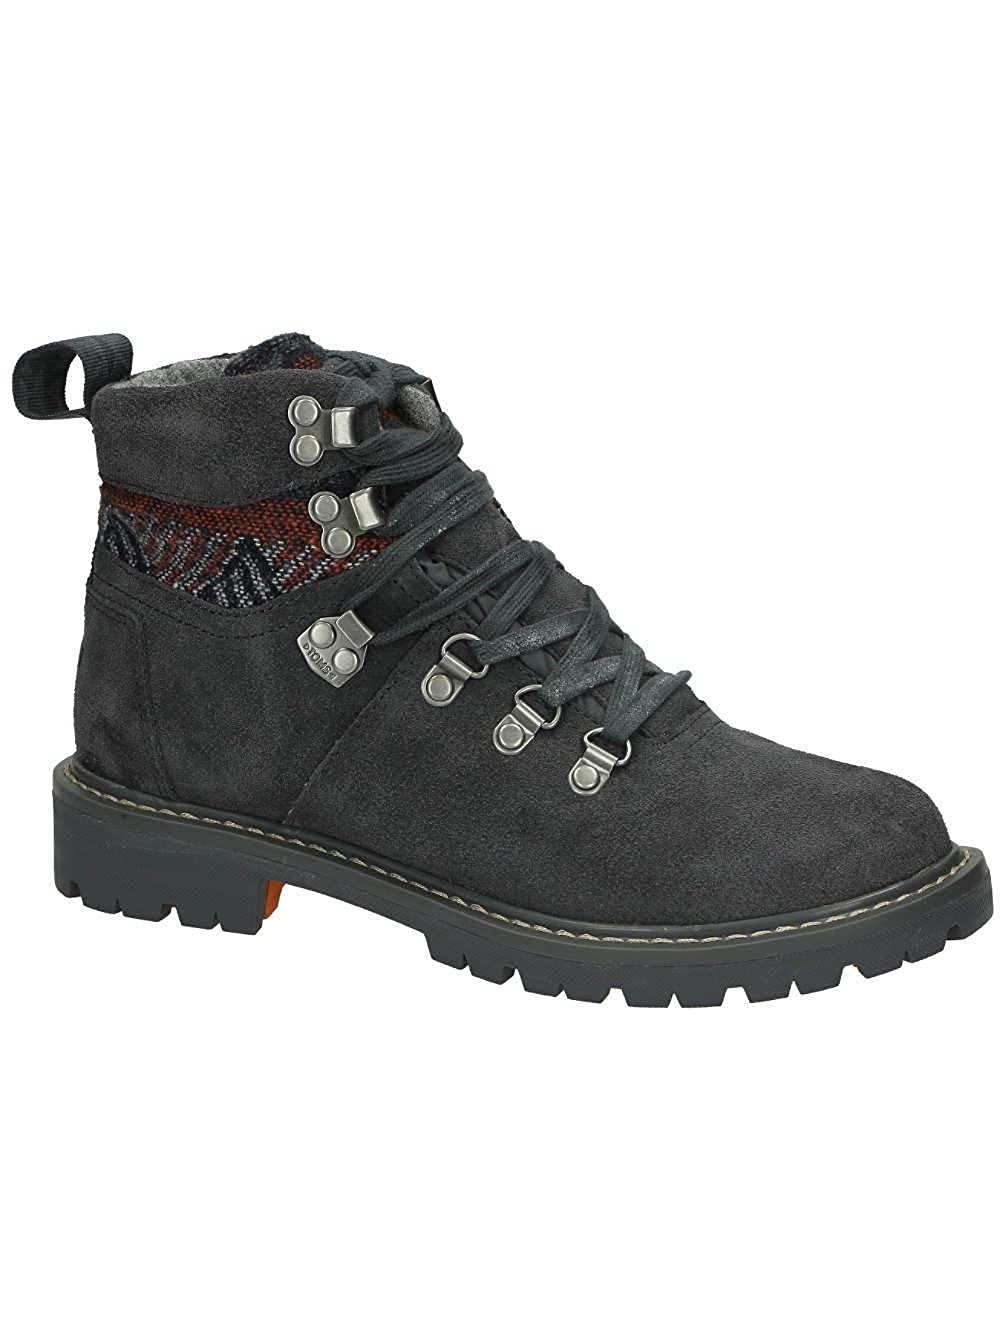 676630473db Boot Women TOMS Summit Hiker Boots Women  Amazon.co.uk  Shoes   Bags